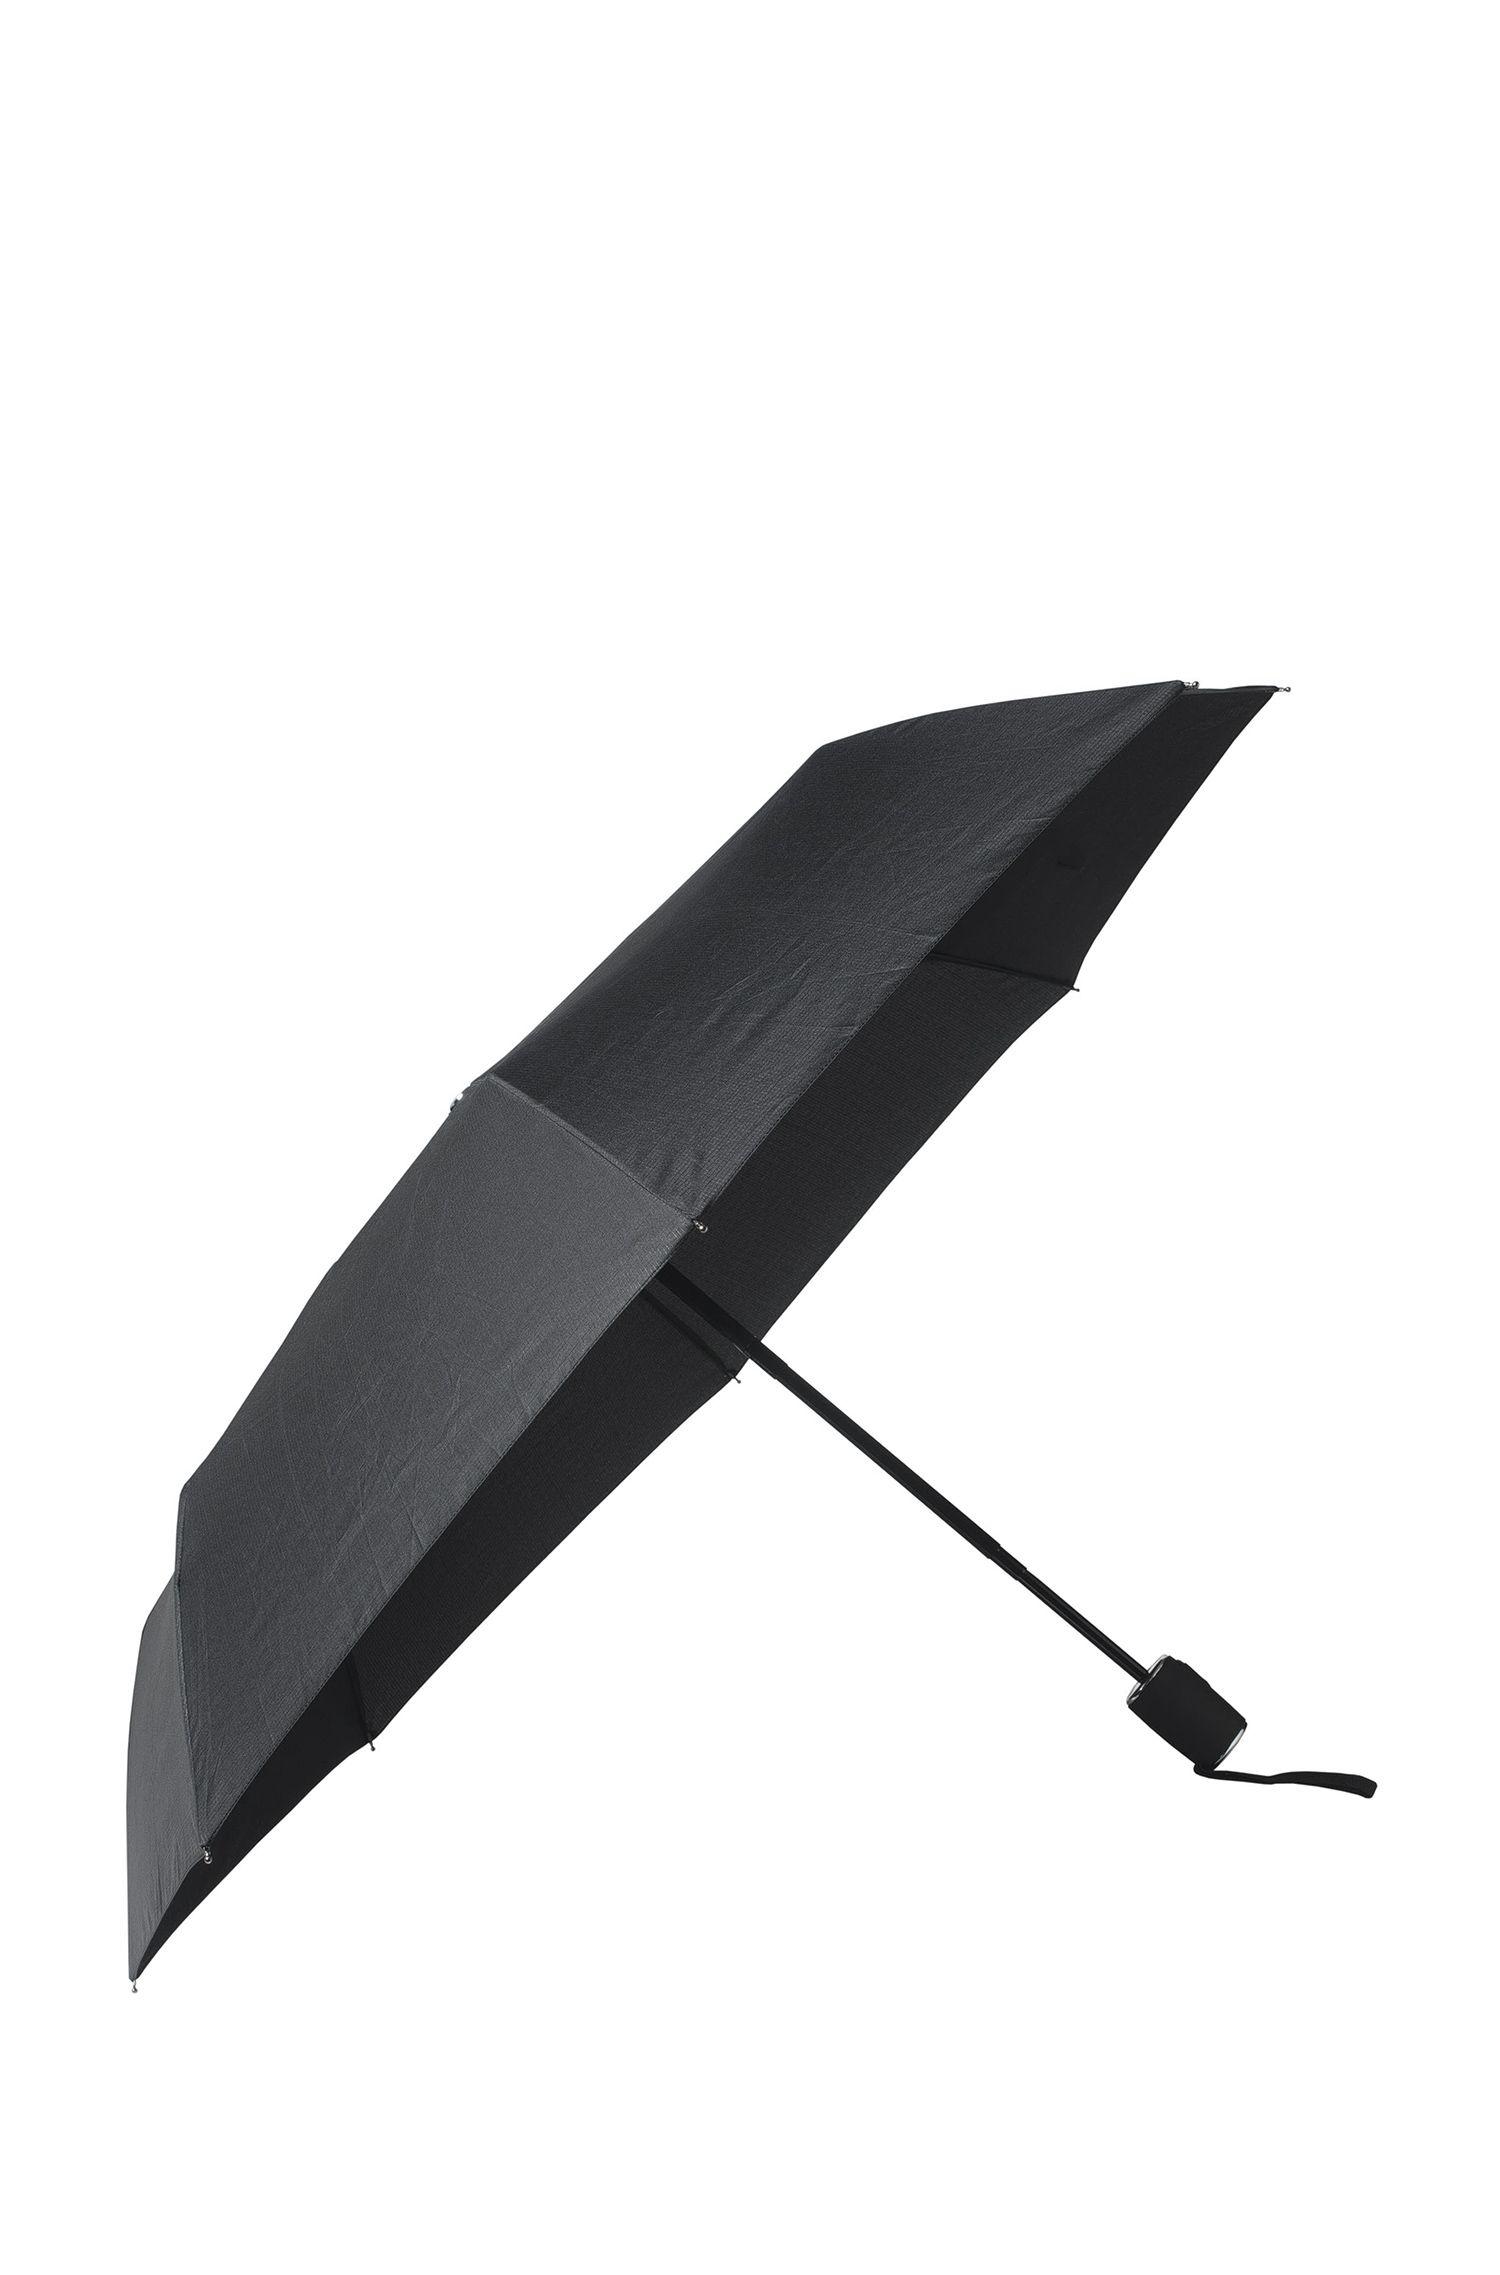 'Grid Pocket' | Nylon Printed Automatic Umbrella